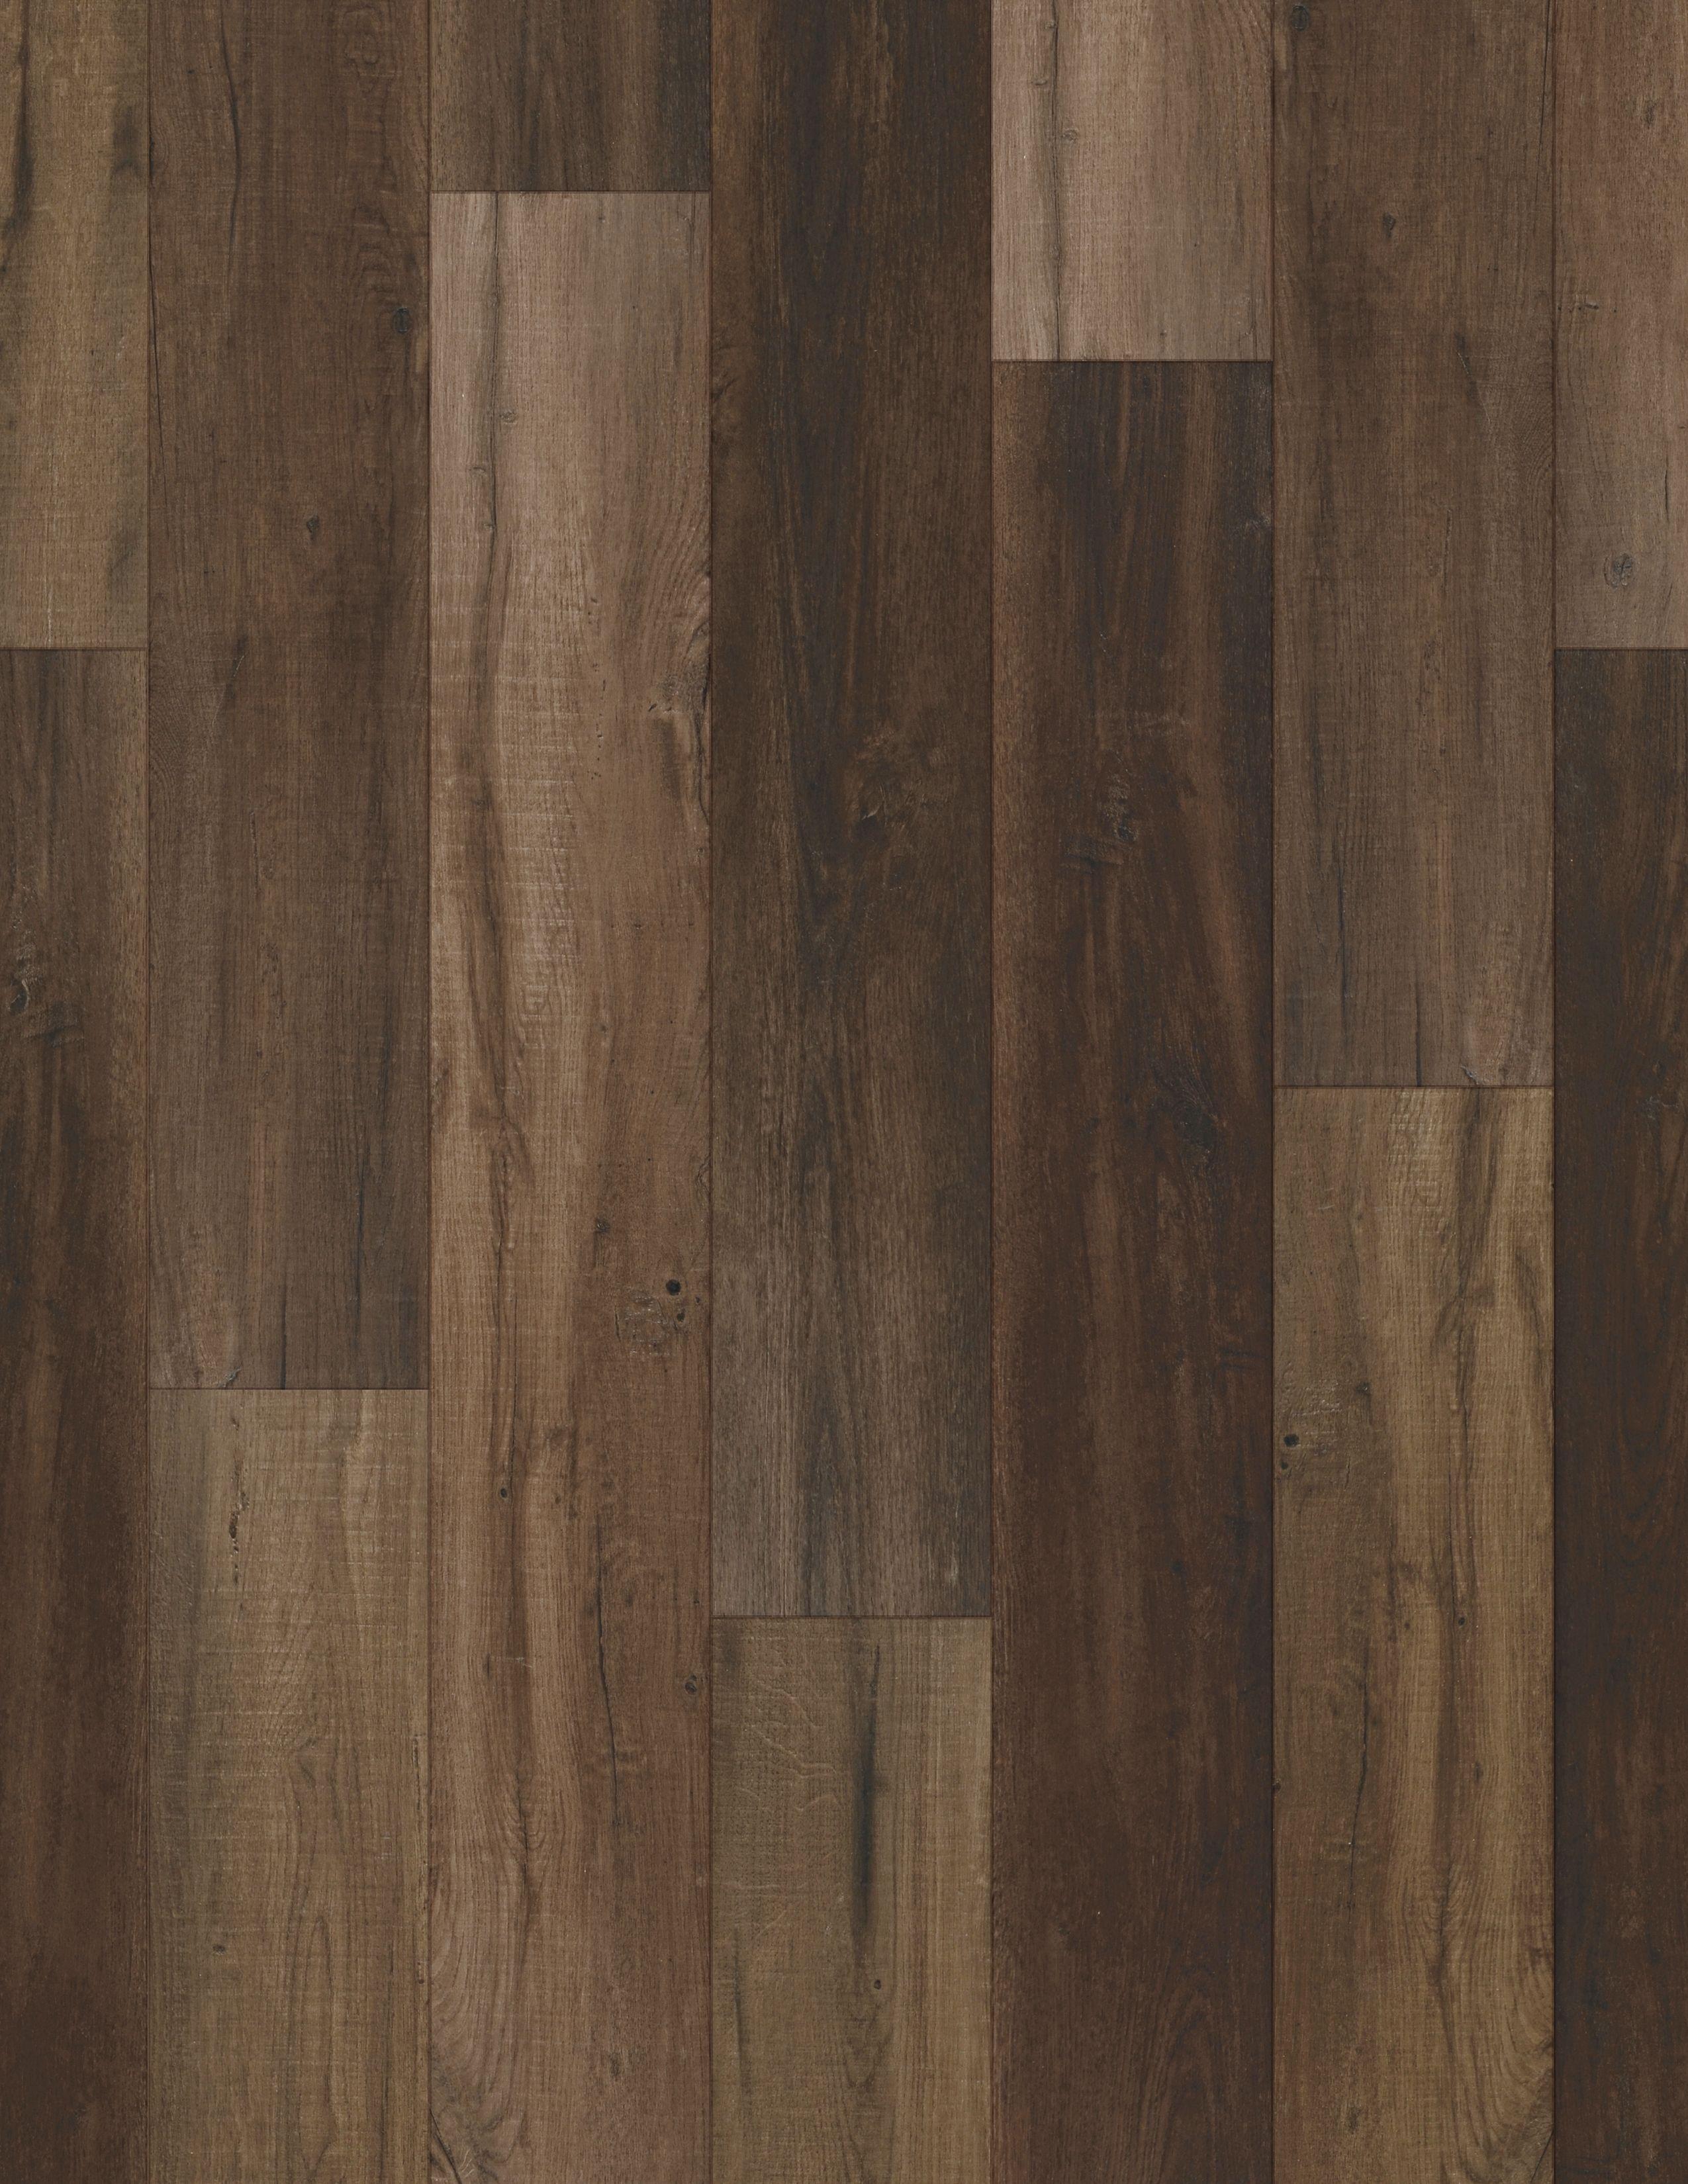 Pin By Betsy Schapp On Home Decor Ideas In 2020 Coretec Coretec Flooring Flooring